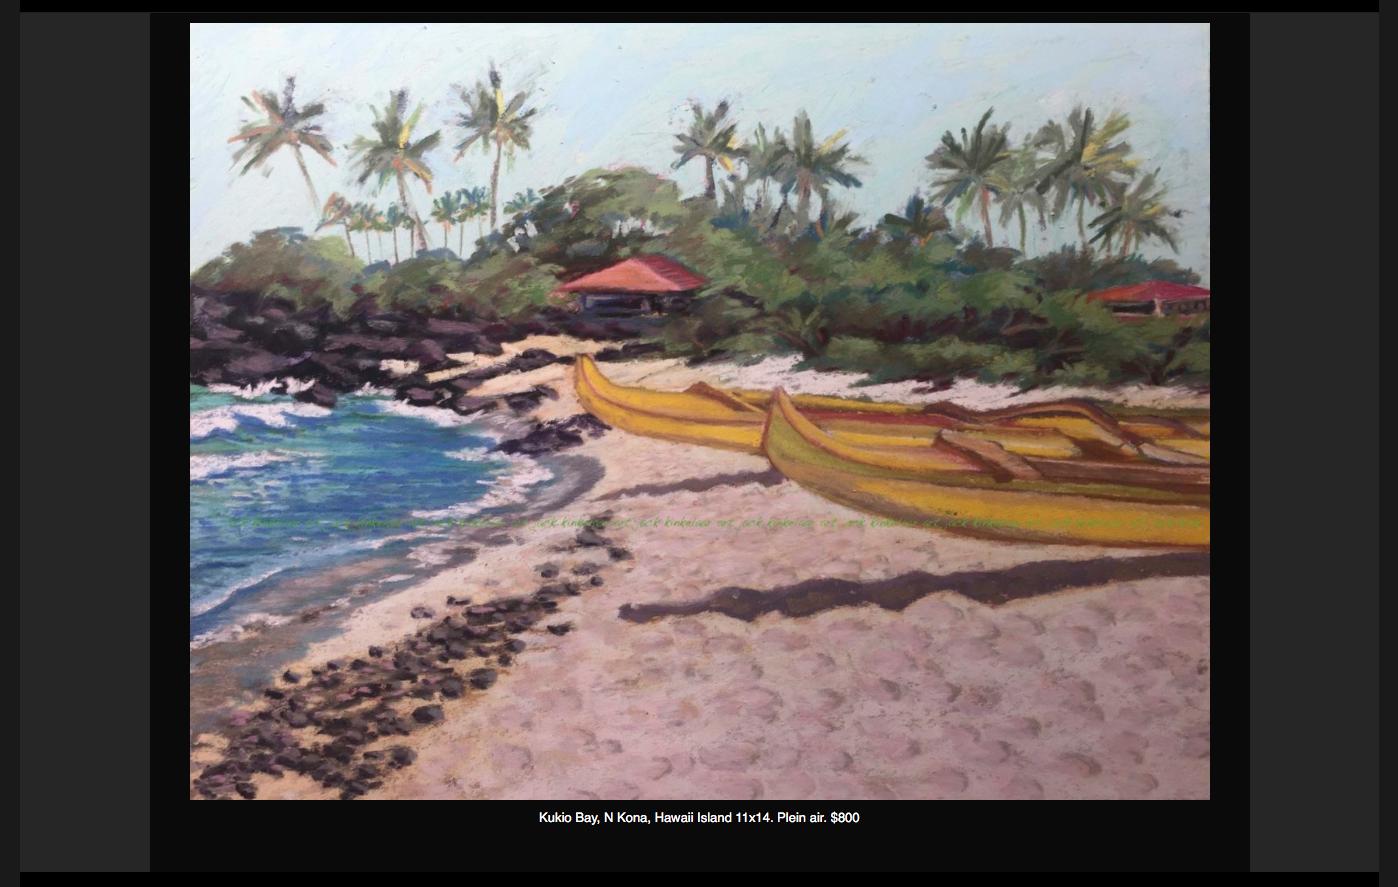 Gallery of Jack Kinkelaar's beautiful artwork.   www.jackkinkelaar.com